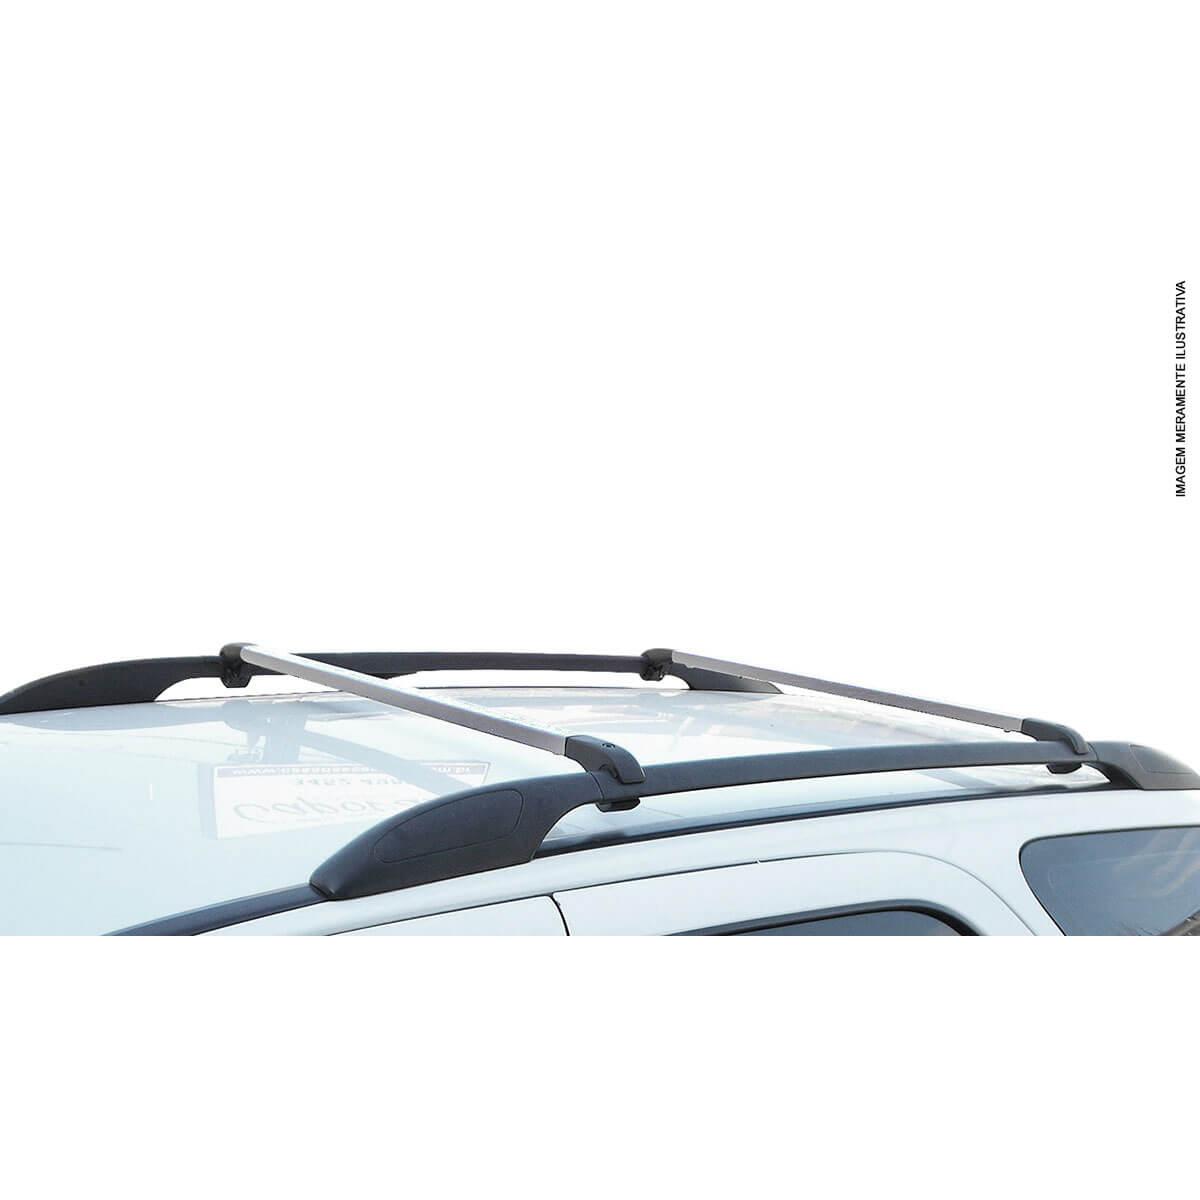 Travessa rack de teto alumínio Aircross 2011 a 2019